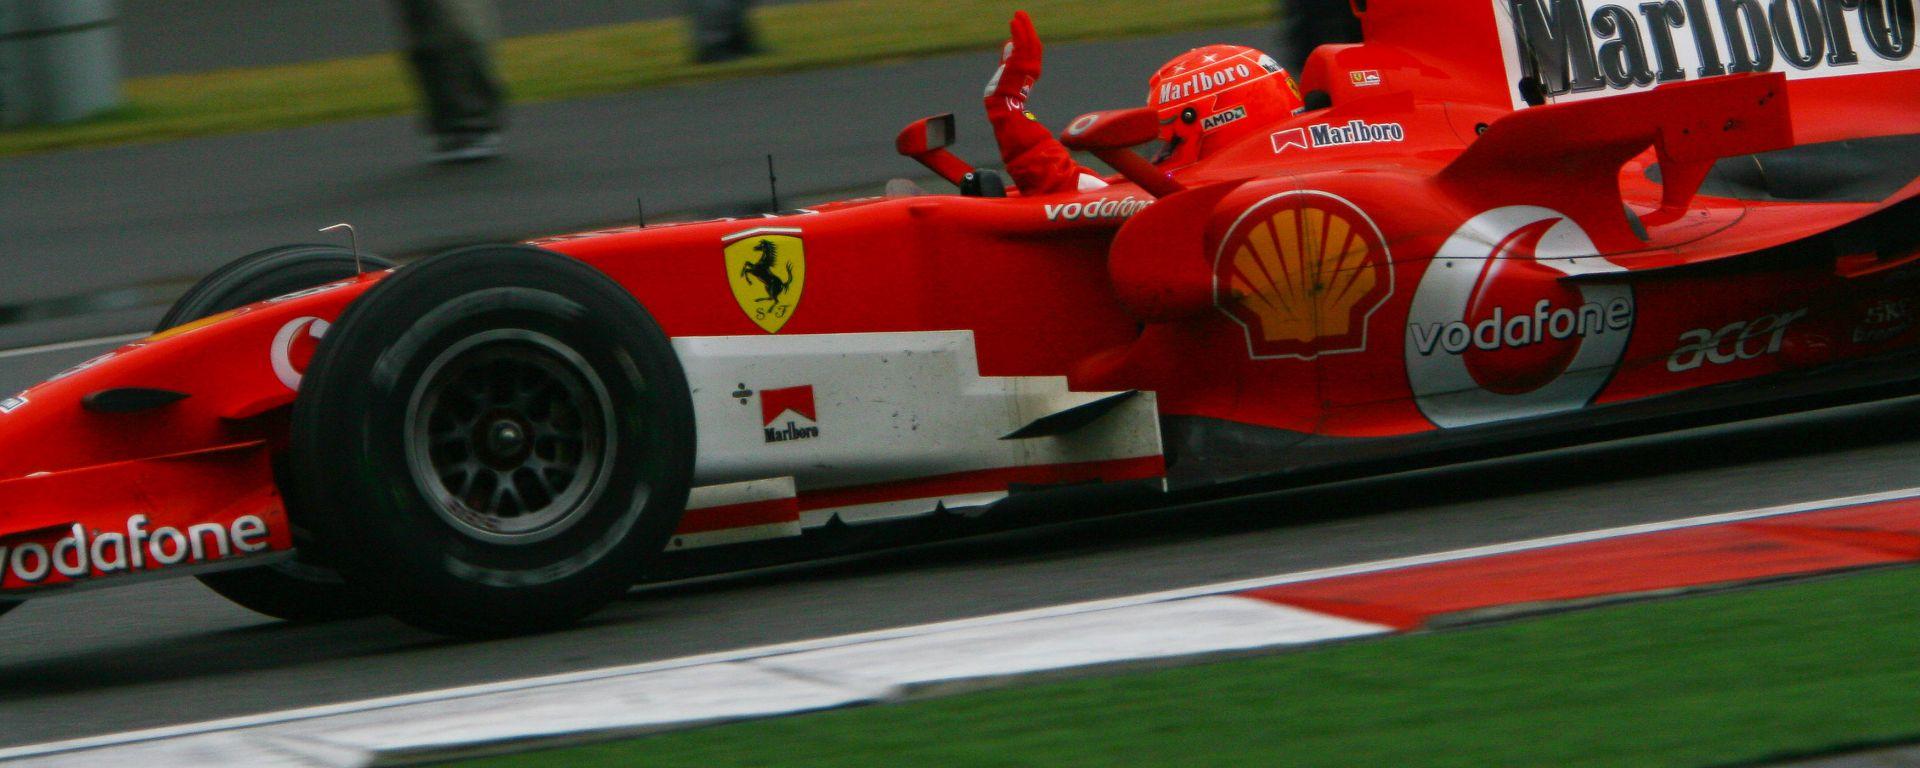 F1 GP Cina 2006, Shanghai: l'ultima vittoria in Ferrari (e della carriera) di Michael Schumacher